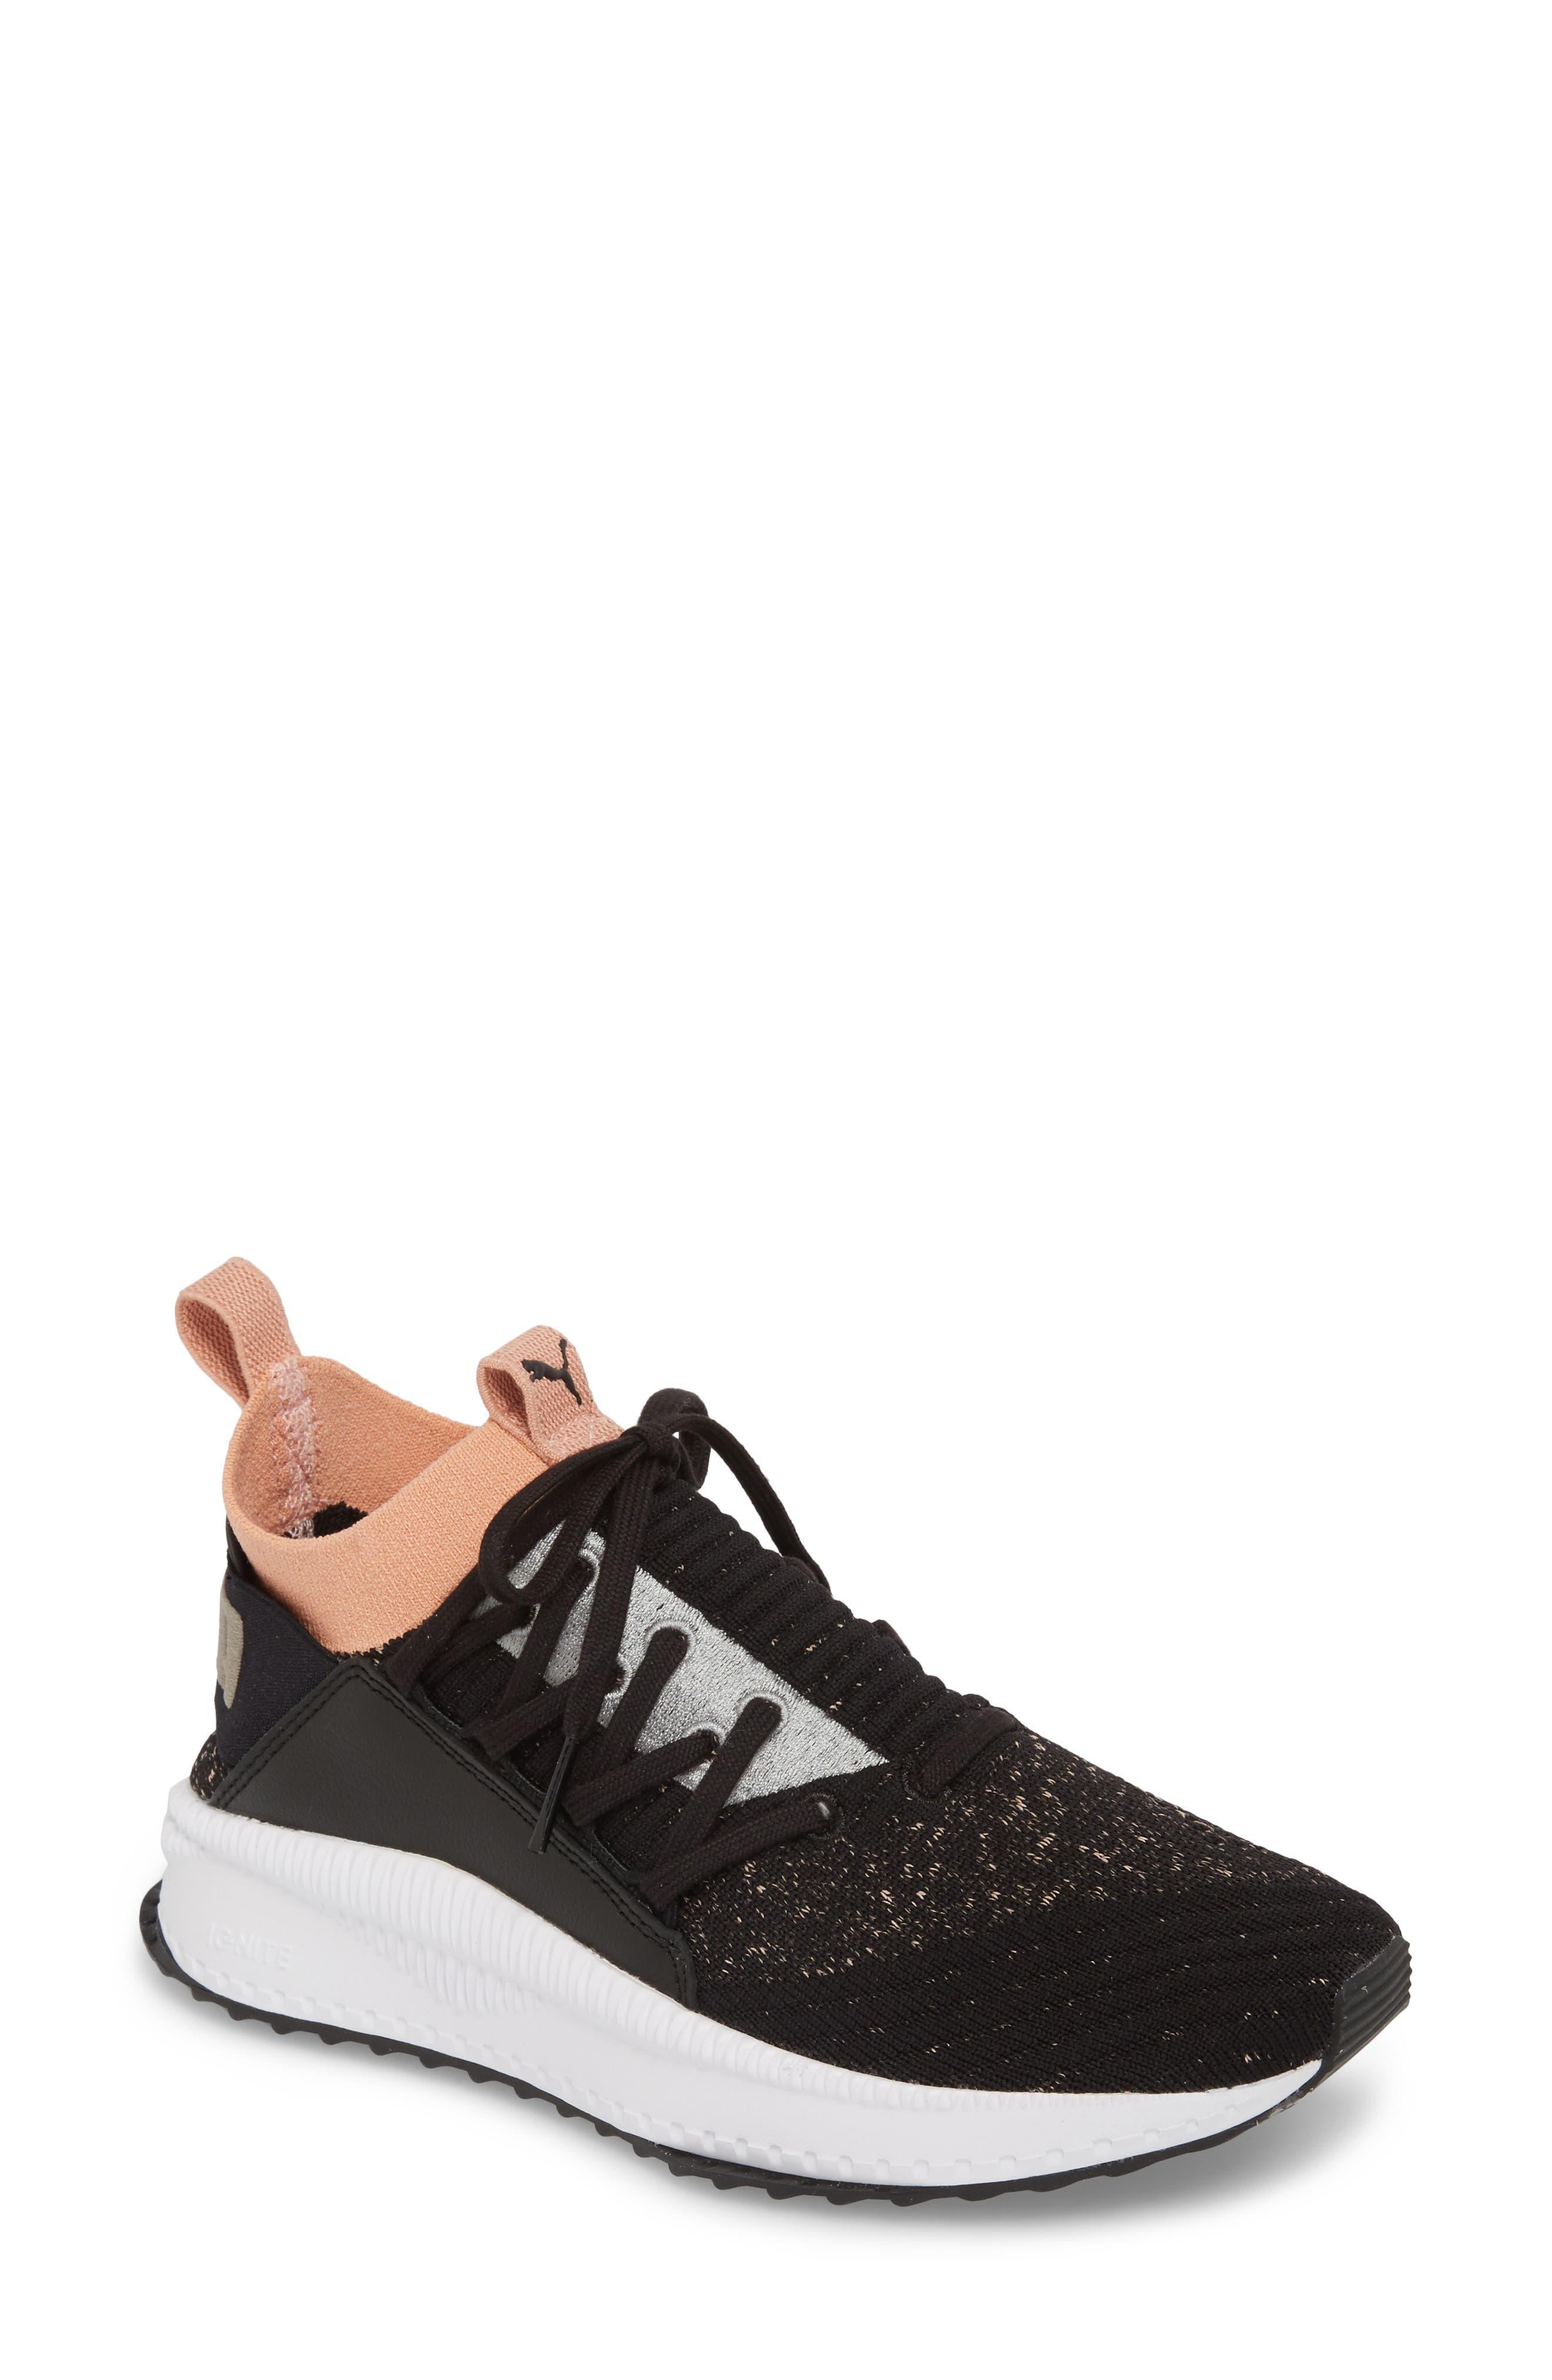 PUMA | Tsugi Jun Knit Sneaker